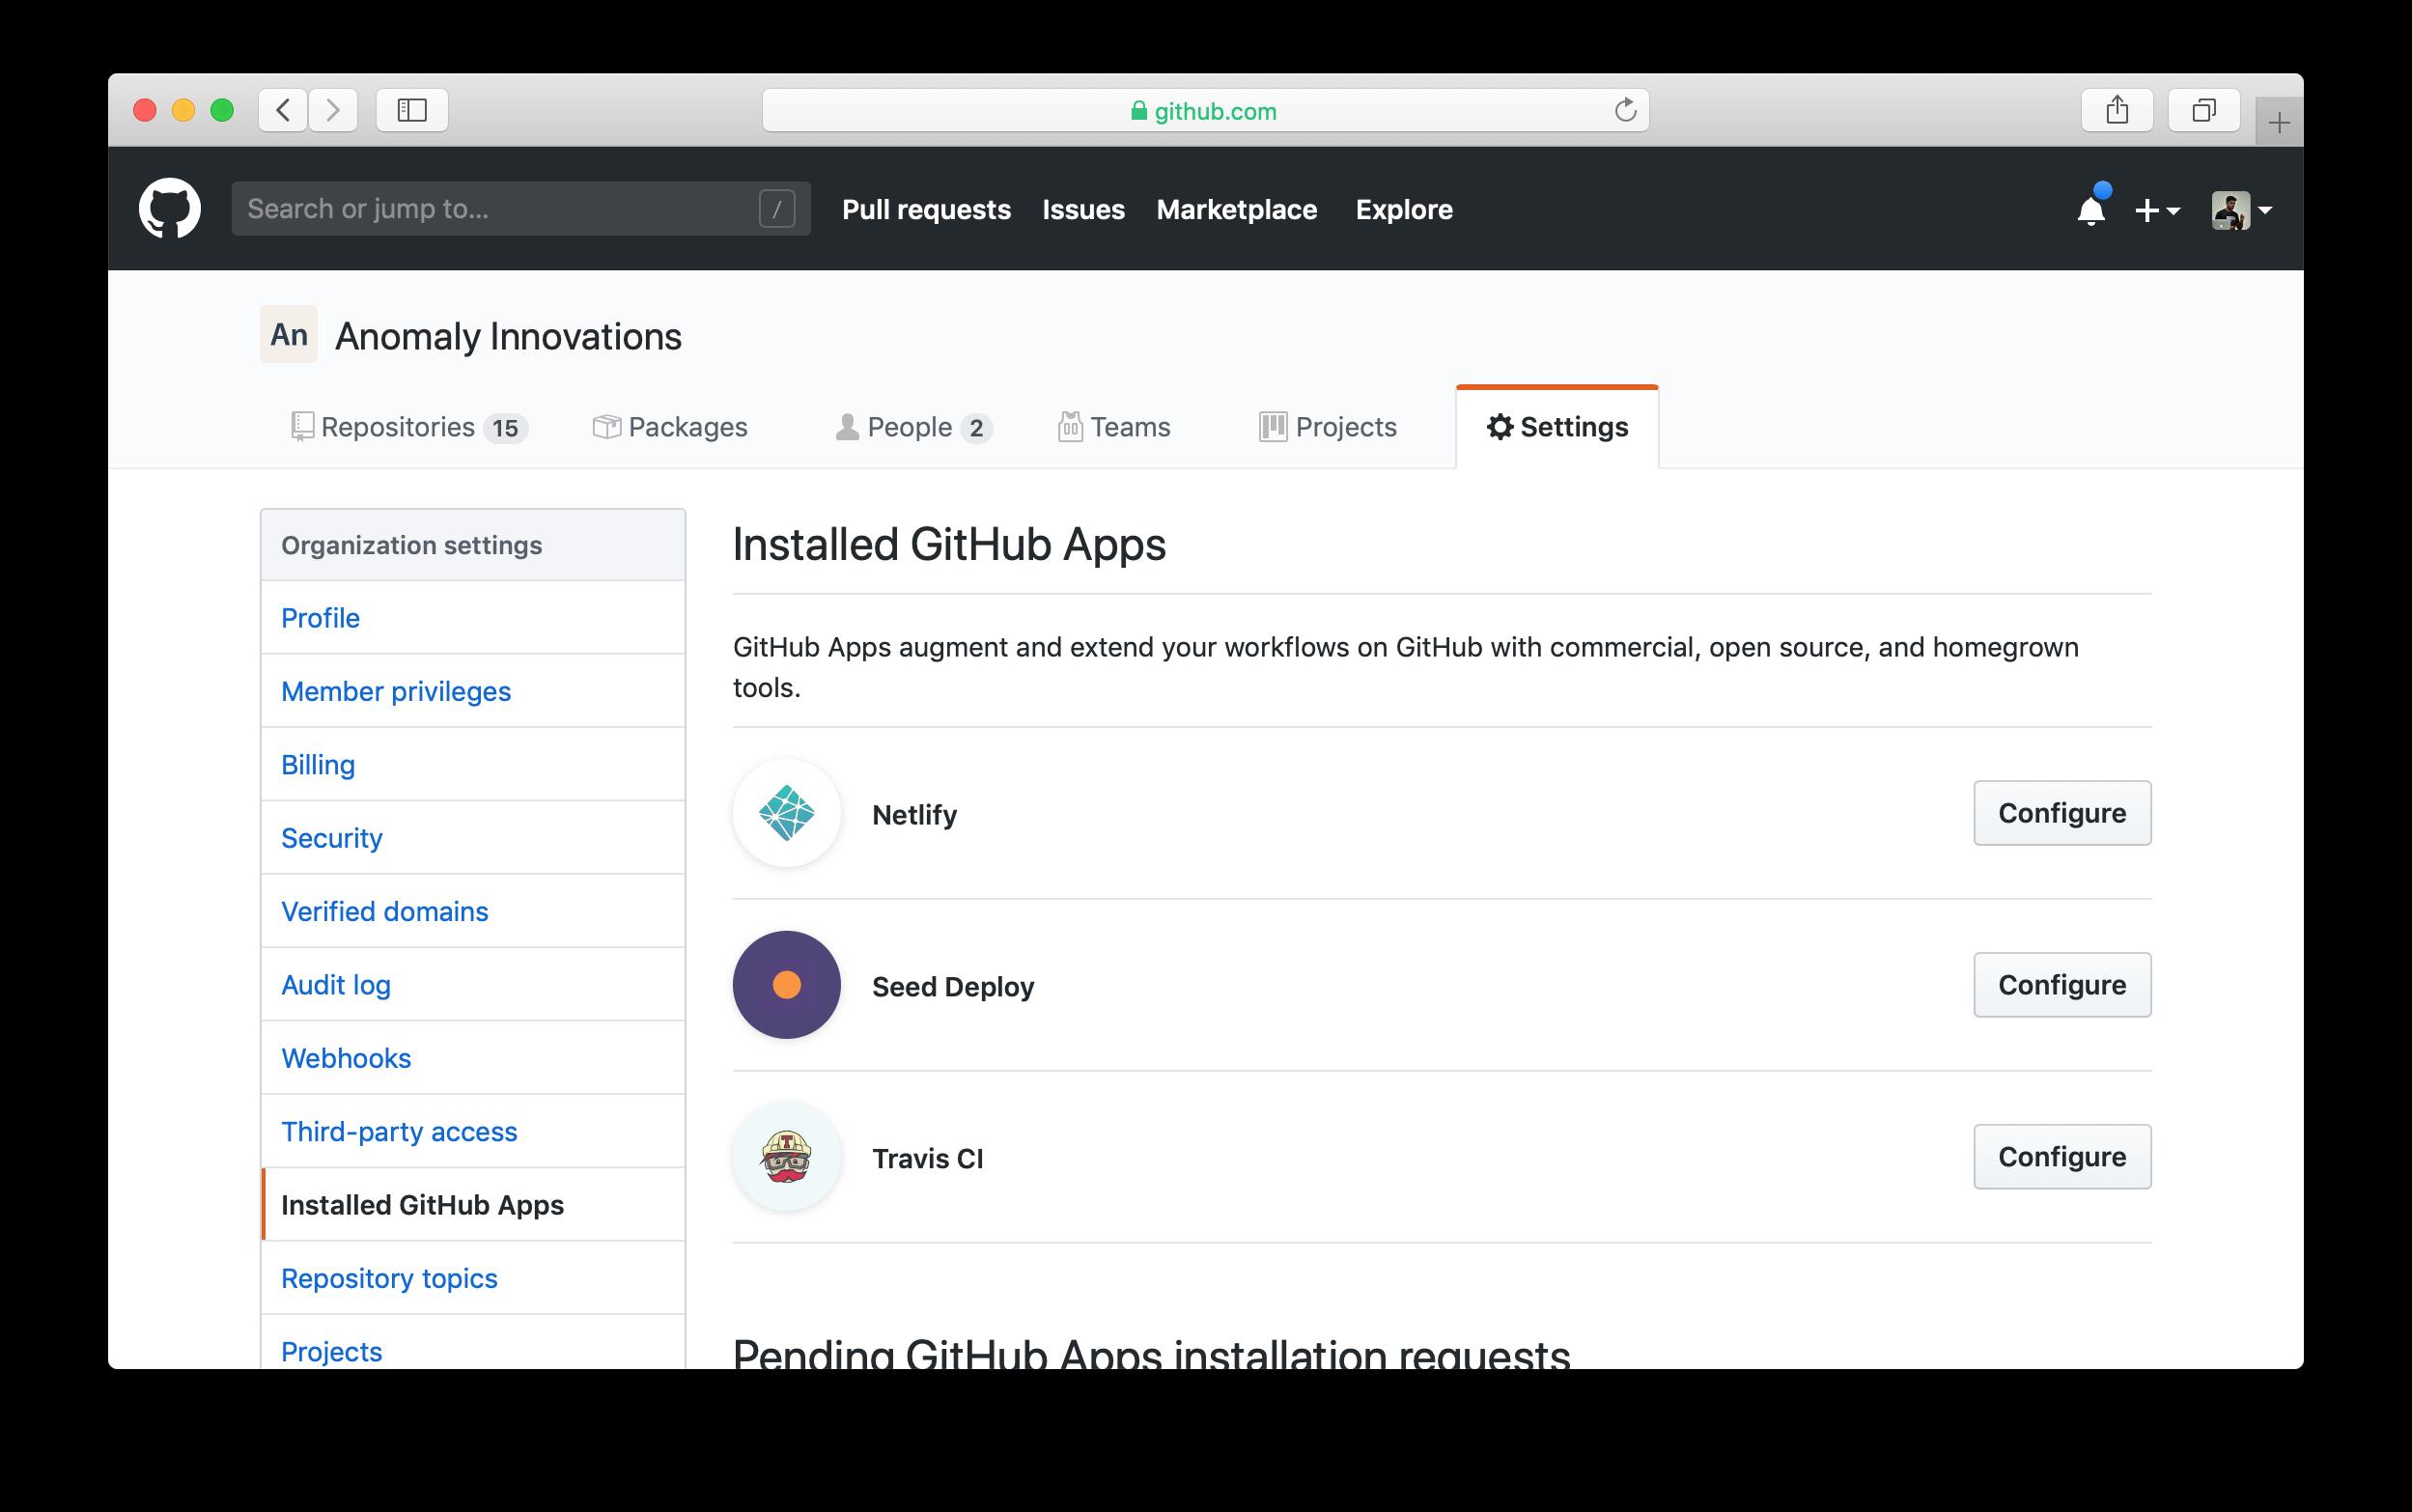 Installed GitHub apps in GitHub organization